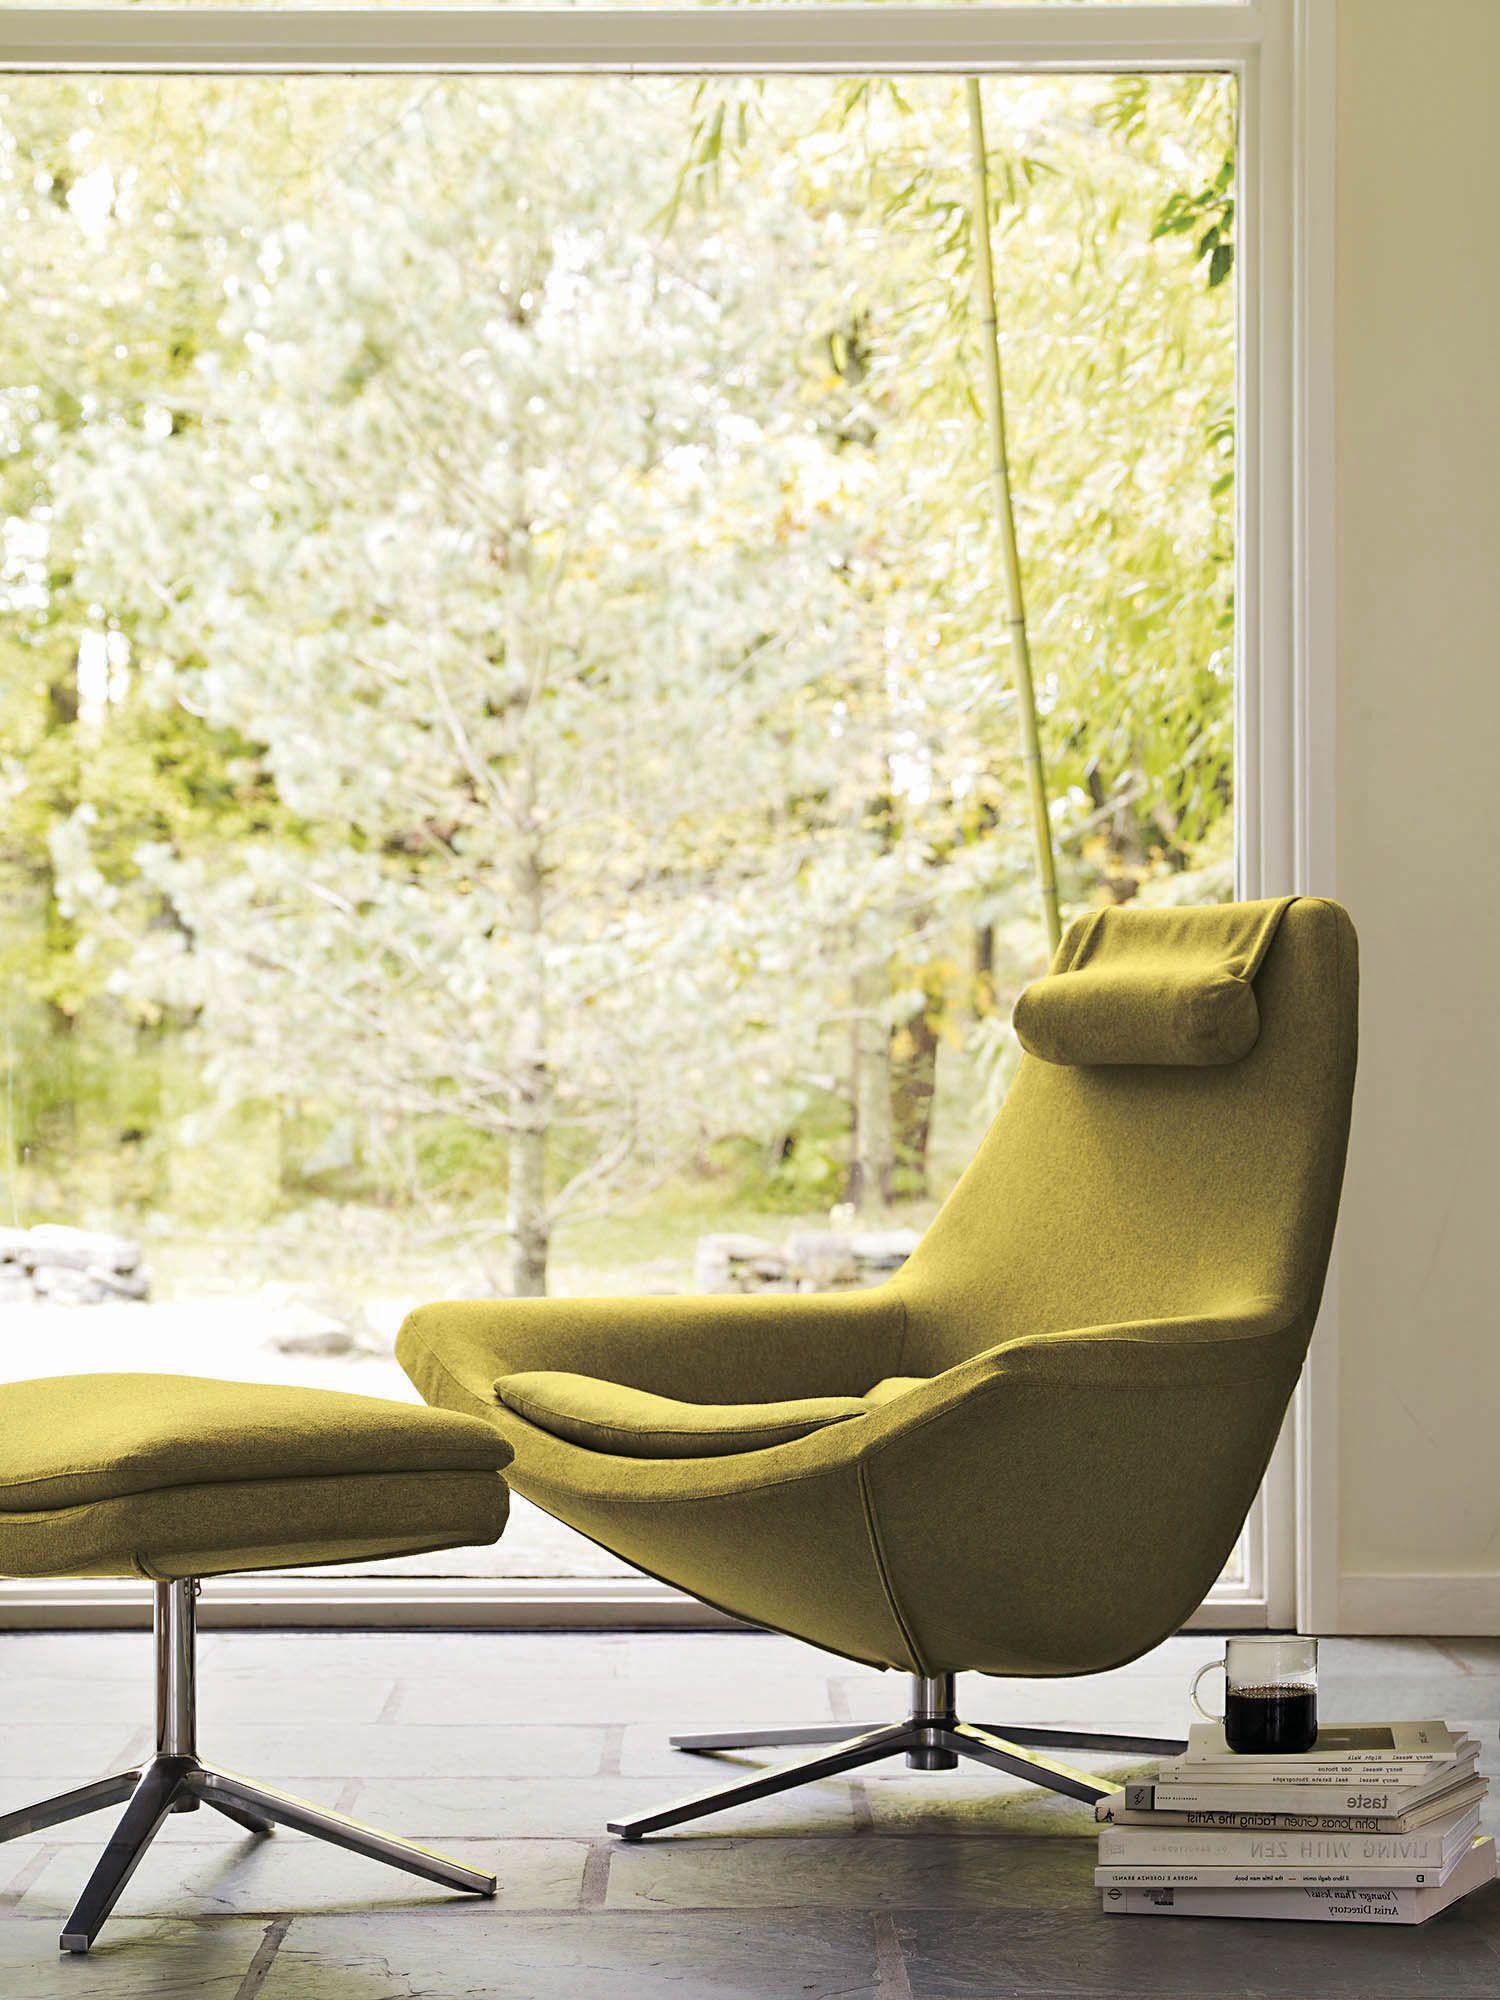 The Metropolitan Chair designed by Jeffrey Bernett for B  B